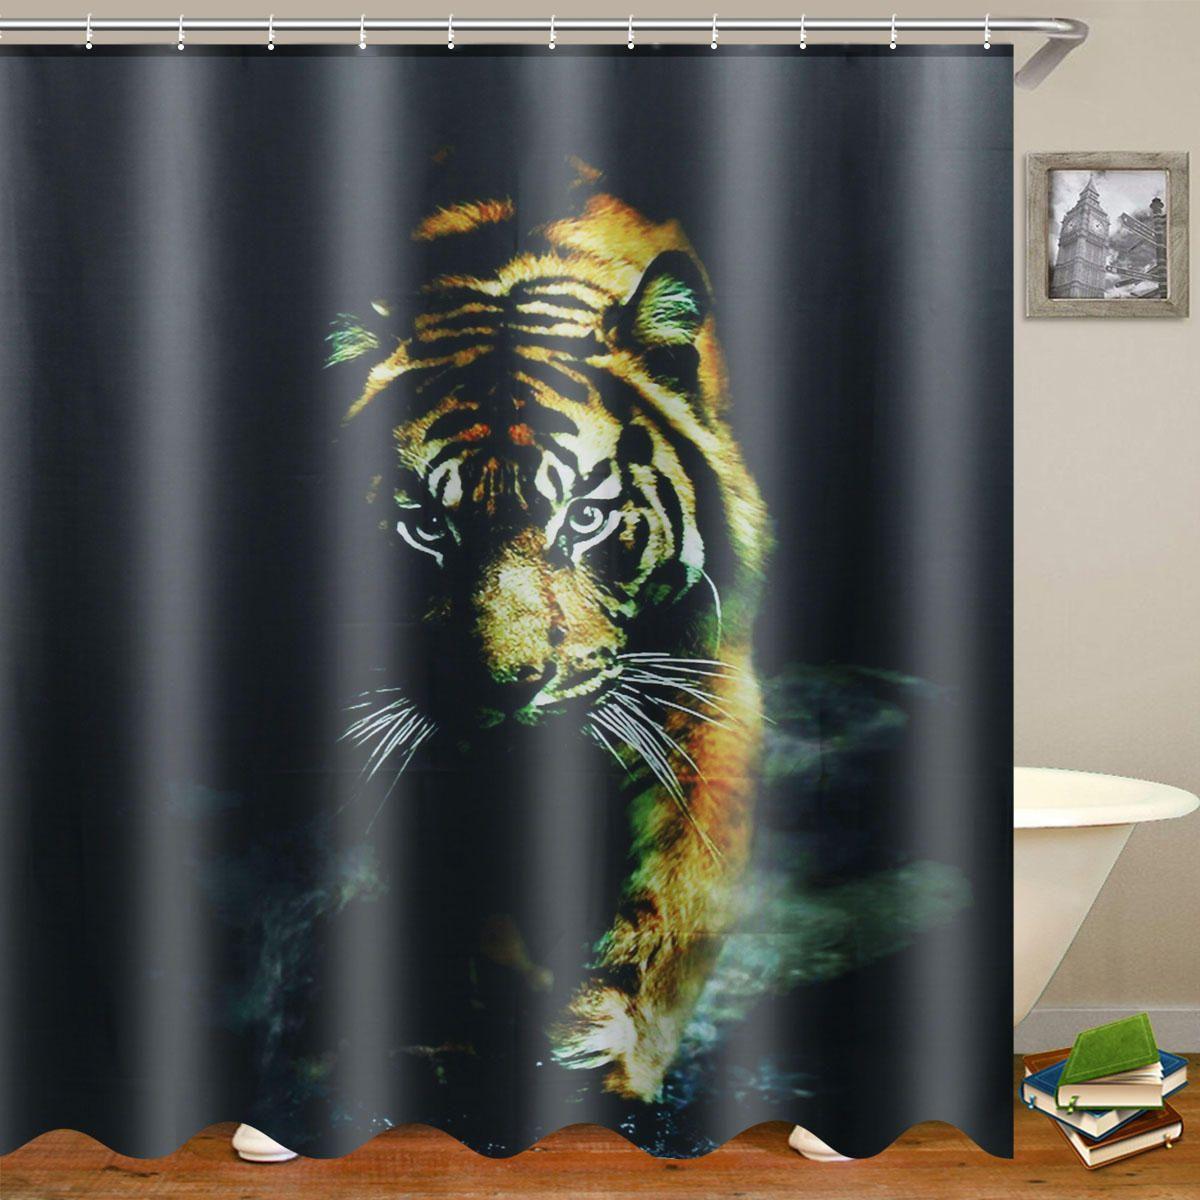 72 X 72 Wildlife Animal Nature Decor Tiger Bathroom Decor Shower